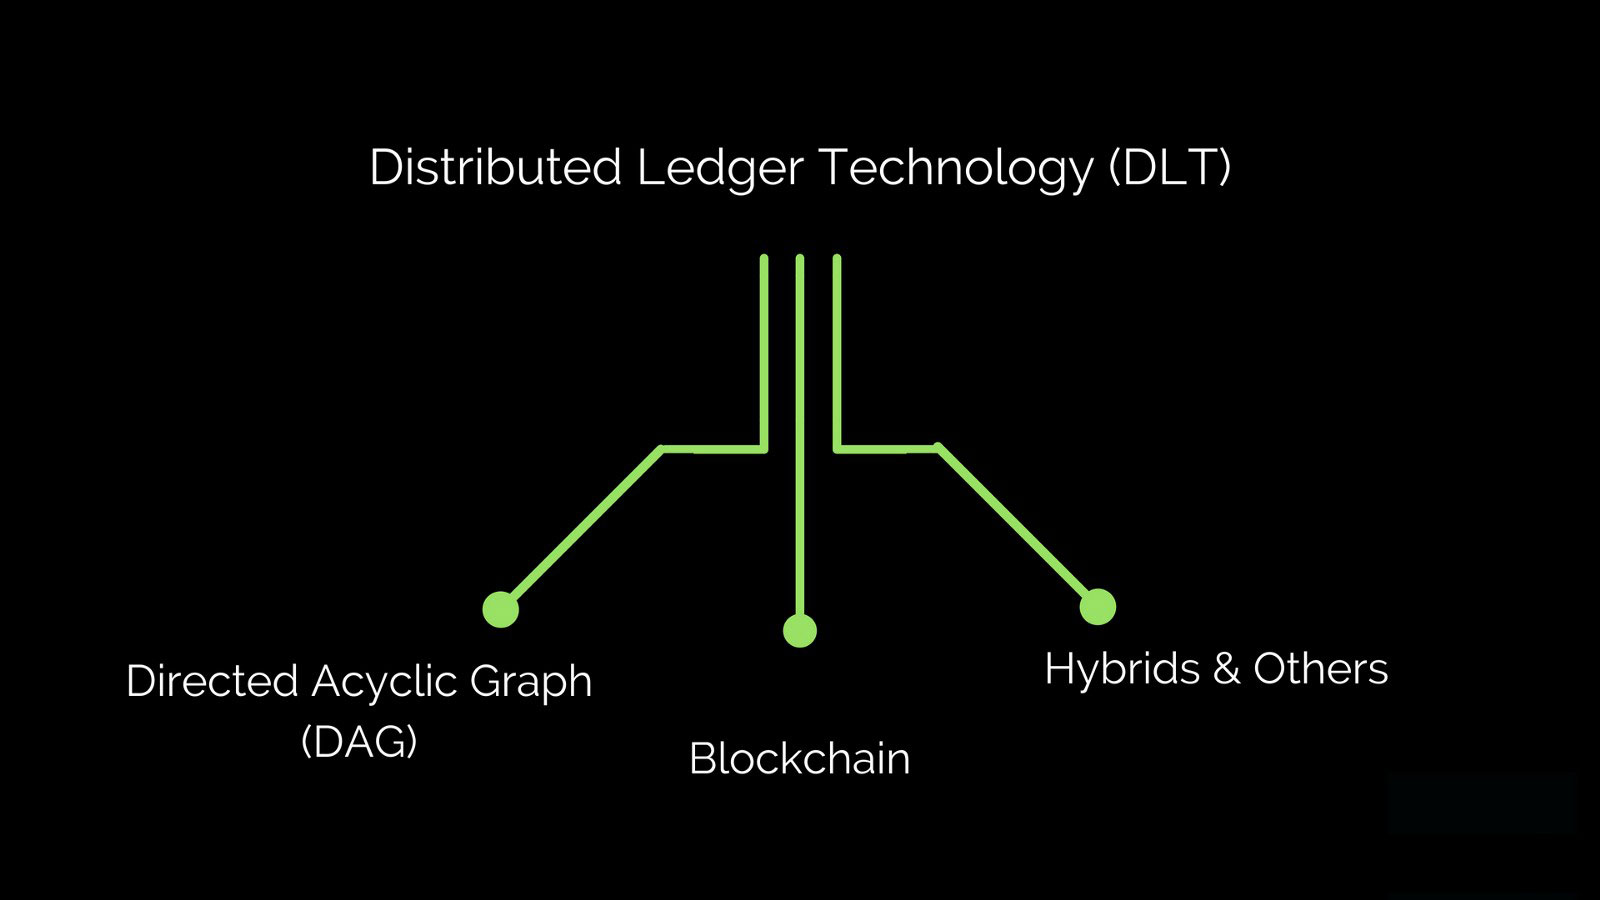 Webitcoin: Distributed Ledger e Blockchain: Entenda a diferença